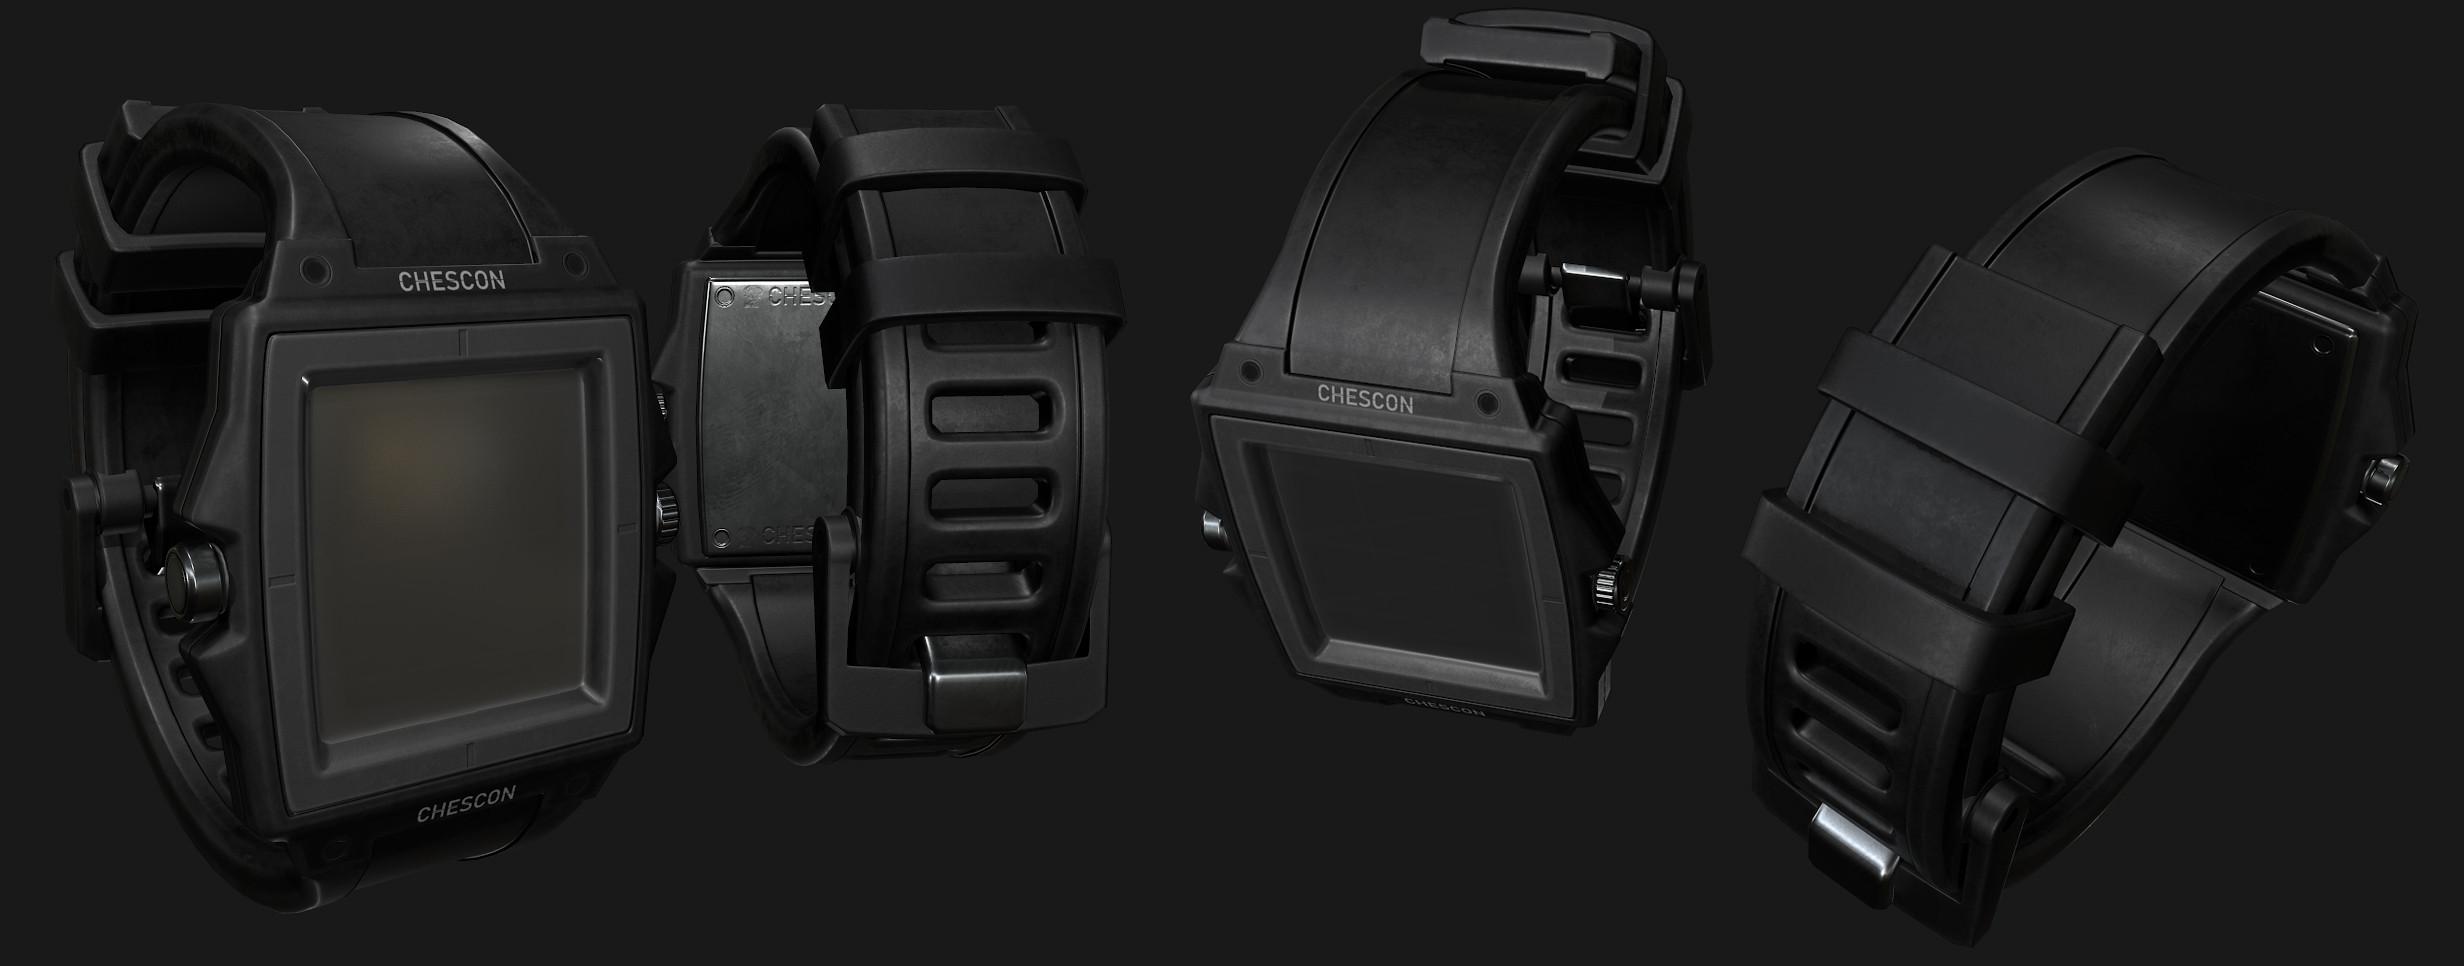 New player compass watch.